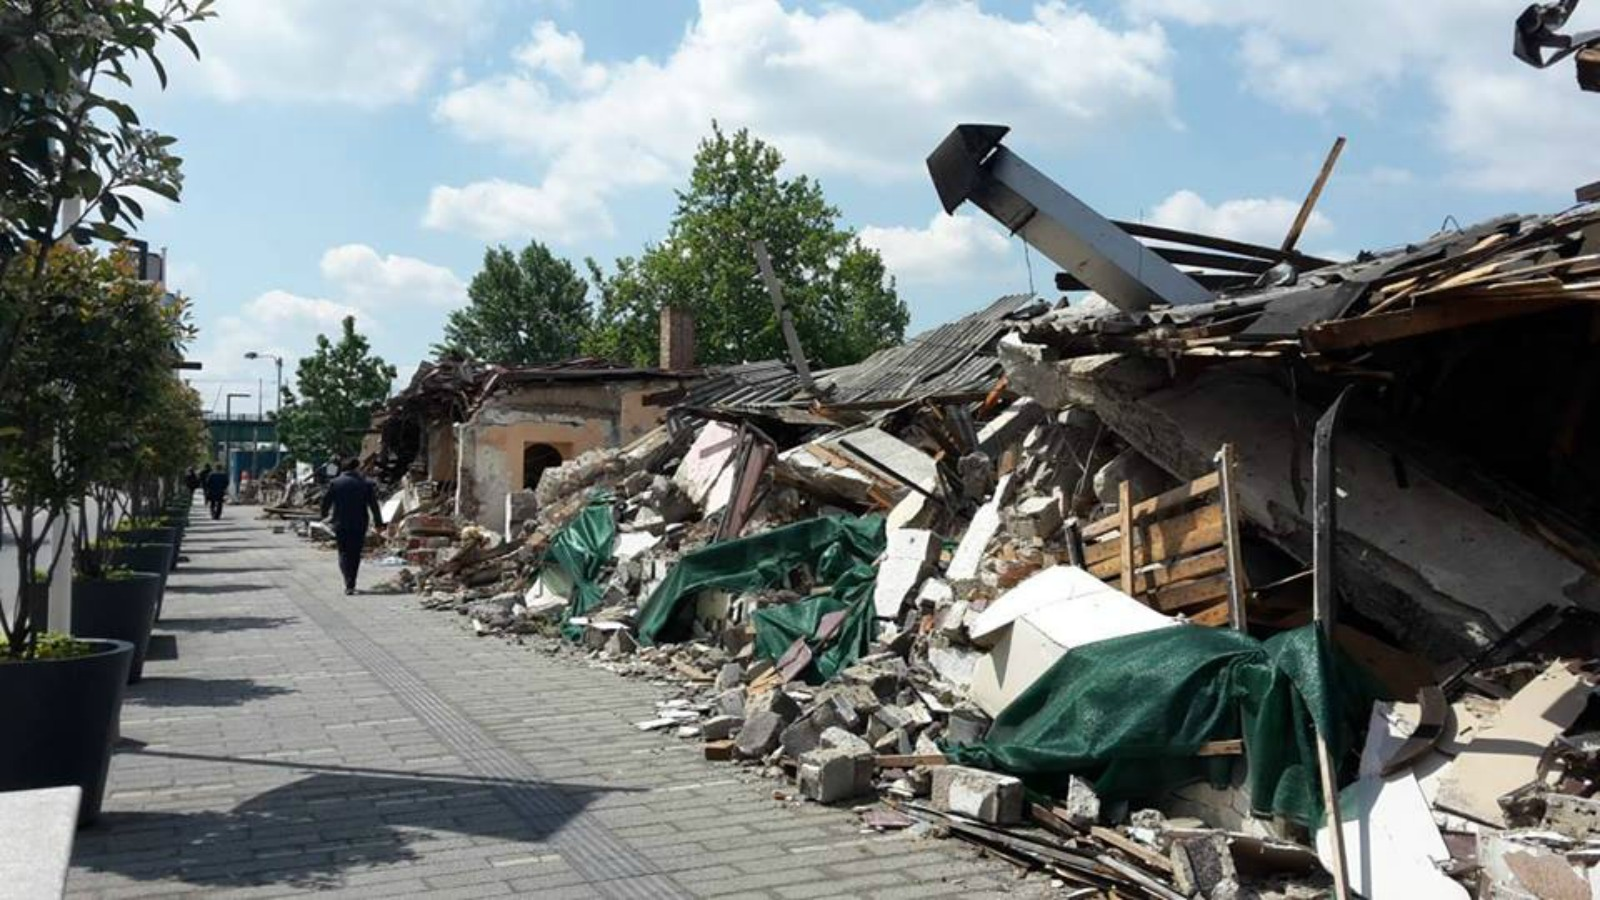 The destroyed buildings at Hercegovacka street [Ne davimo Beograd (Don't drown Belgrade Initiative]